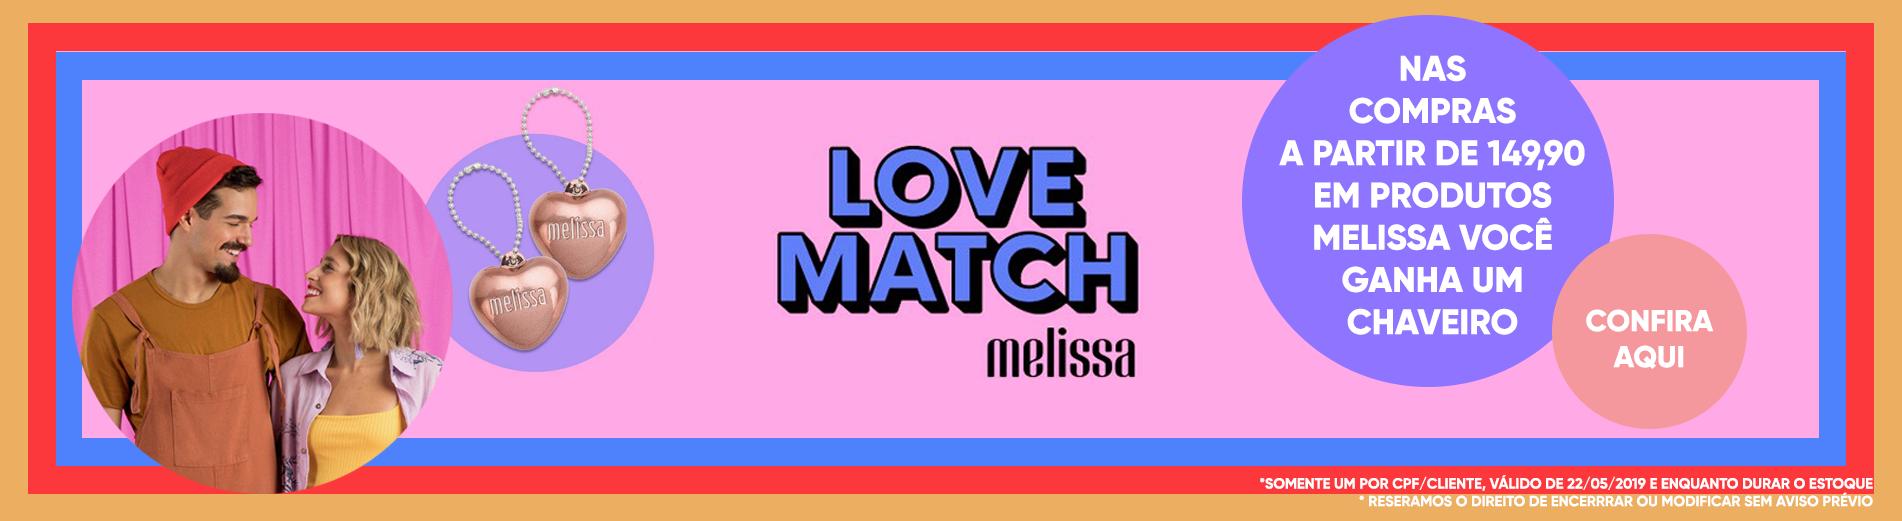 Love Match Melissa